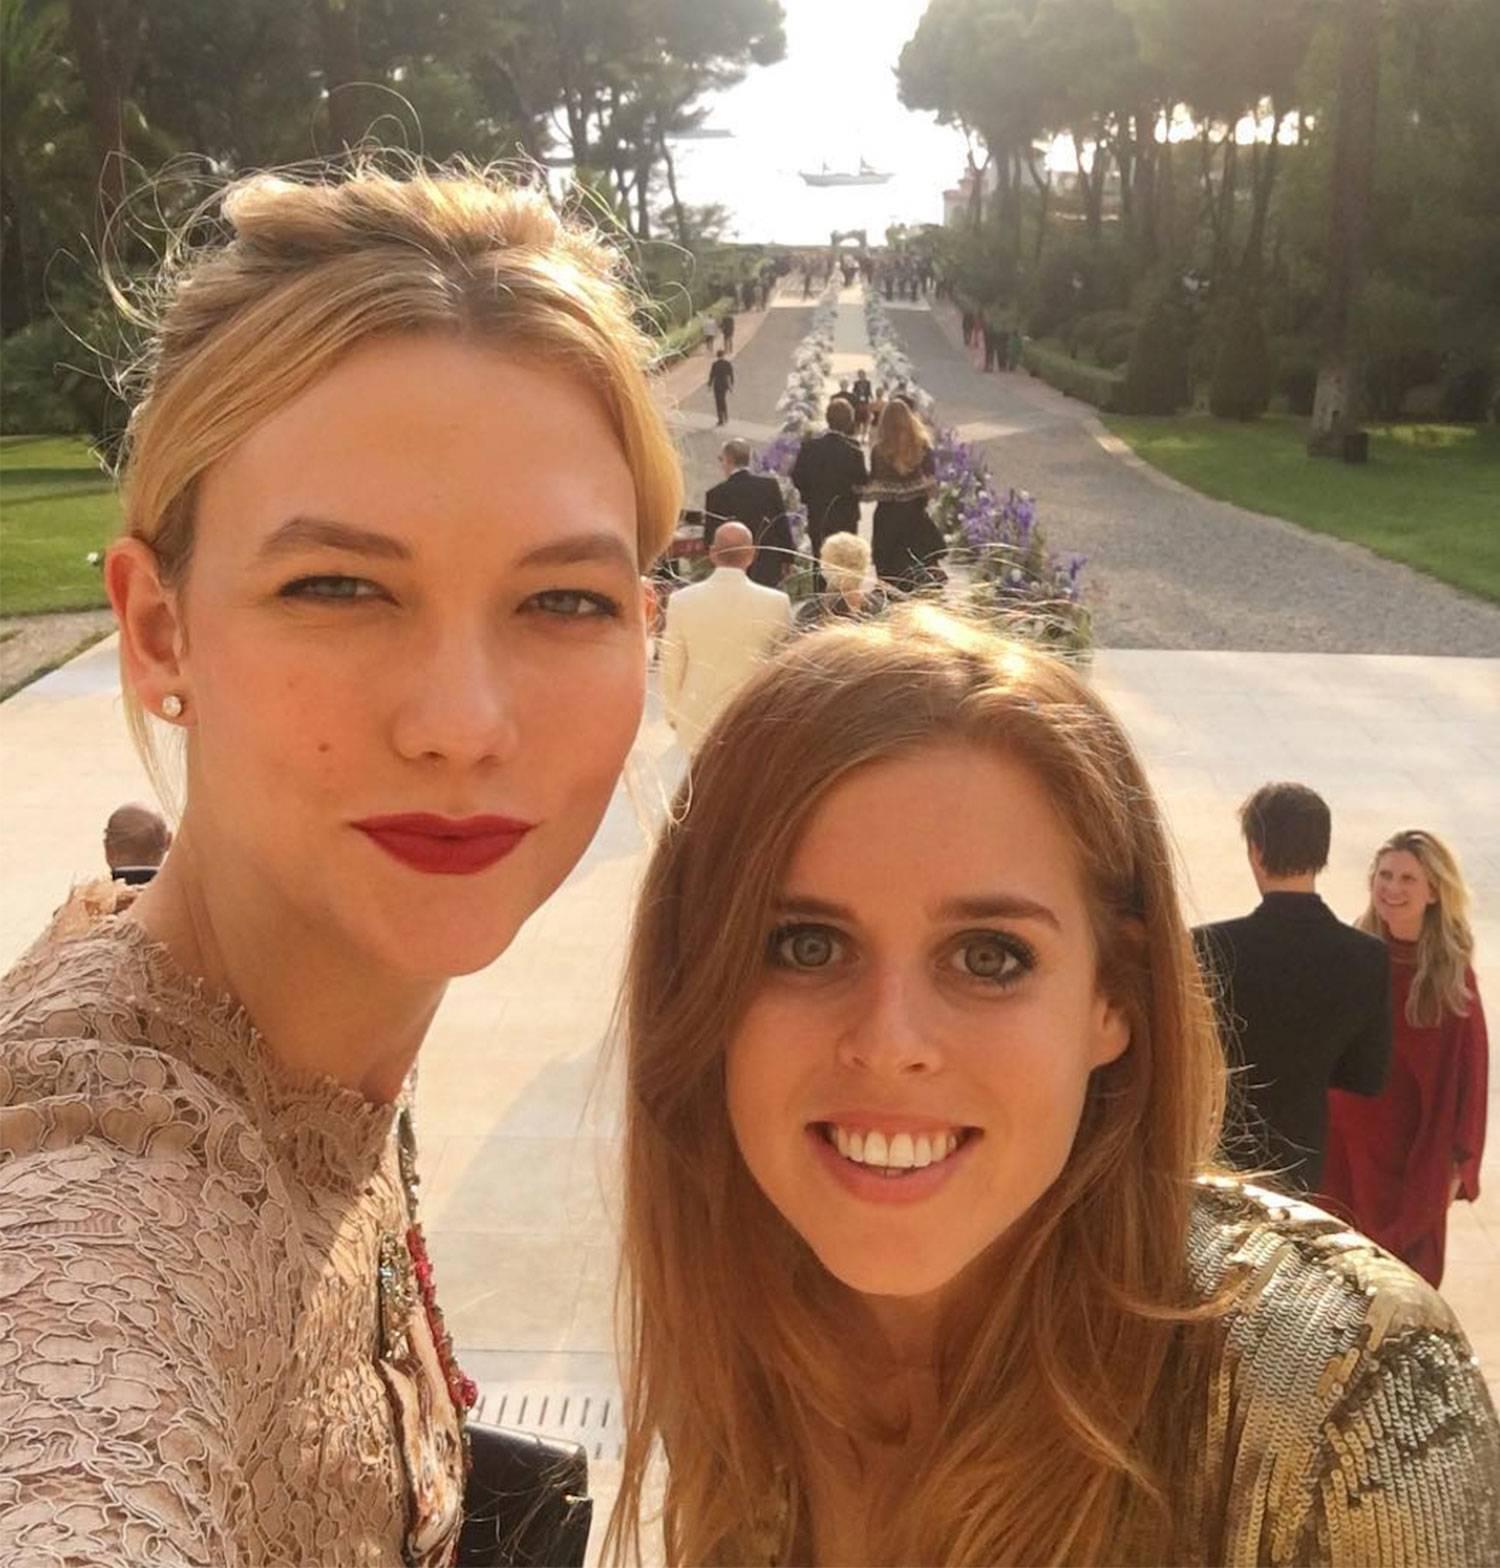 Karlie Kloss just revealed Princess Beatrice's secret Instagram account